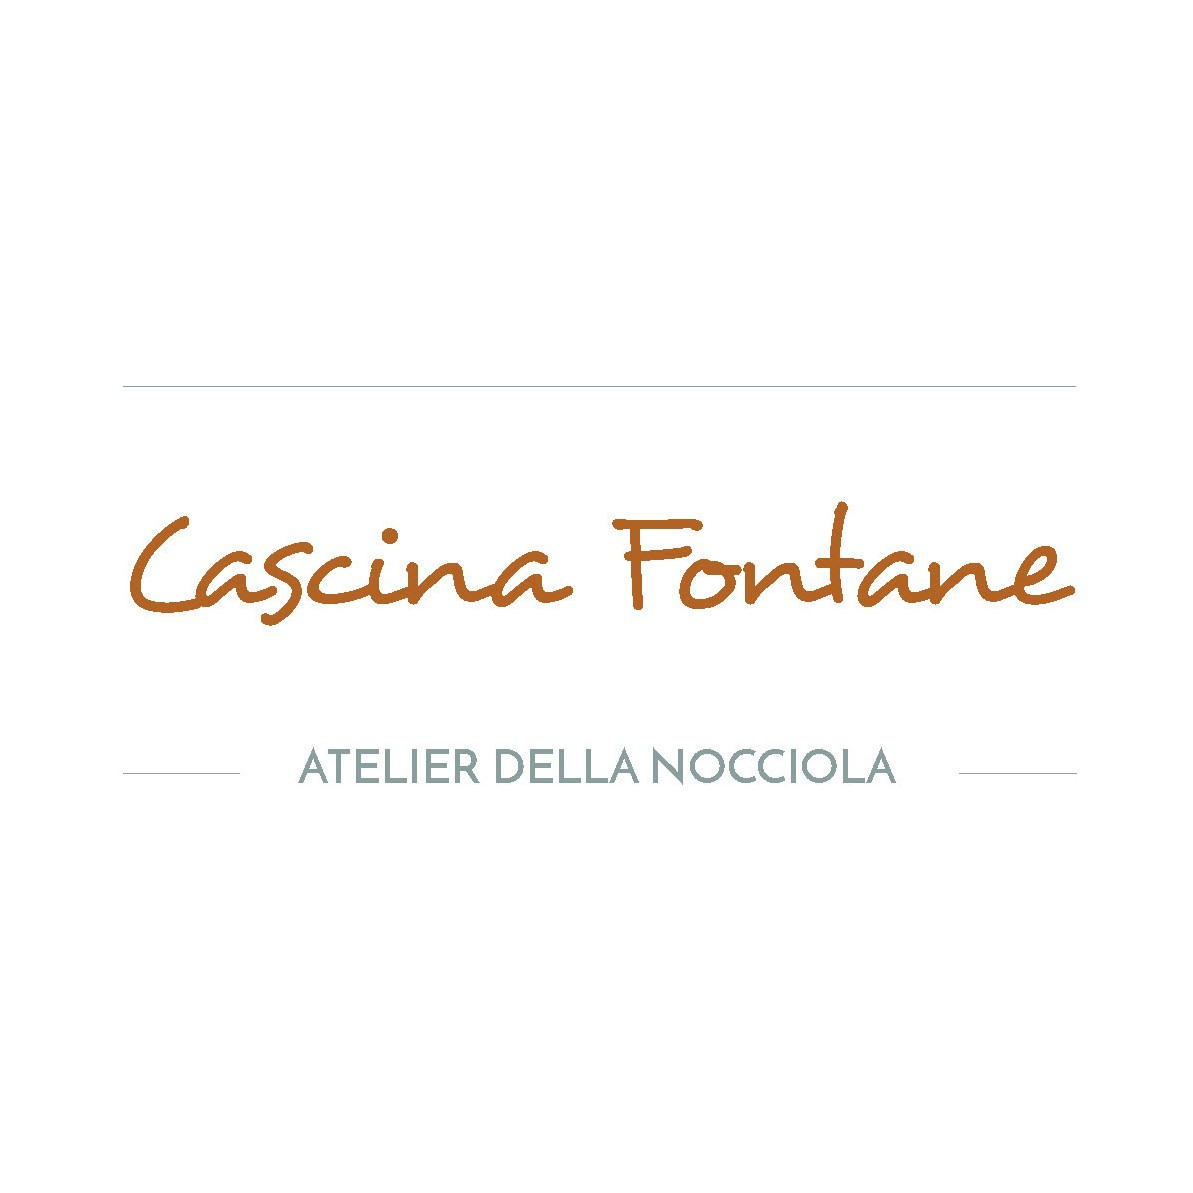 CASCINA FONTANE